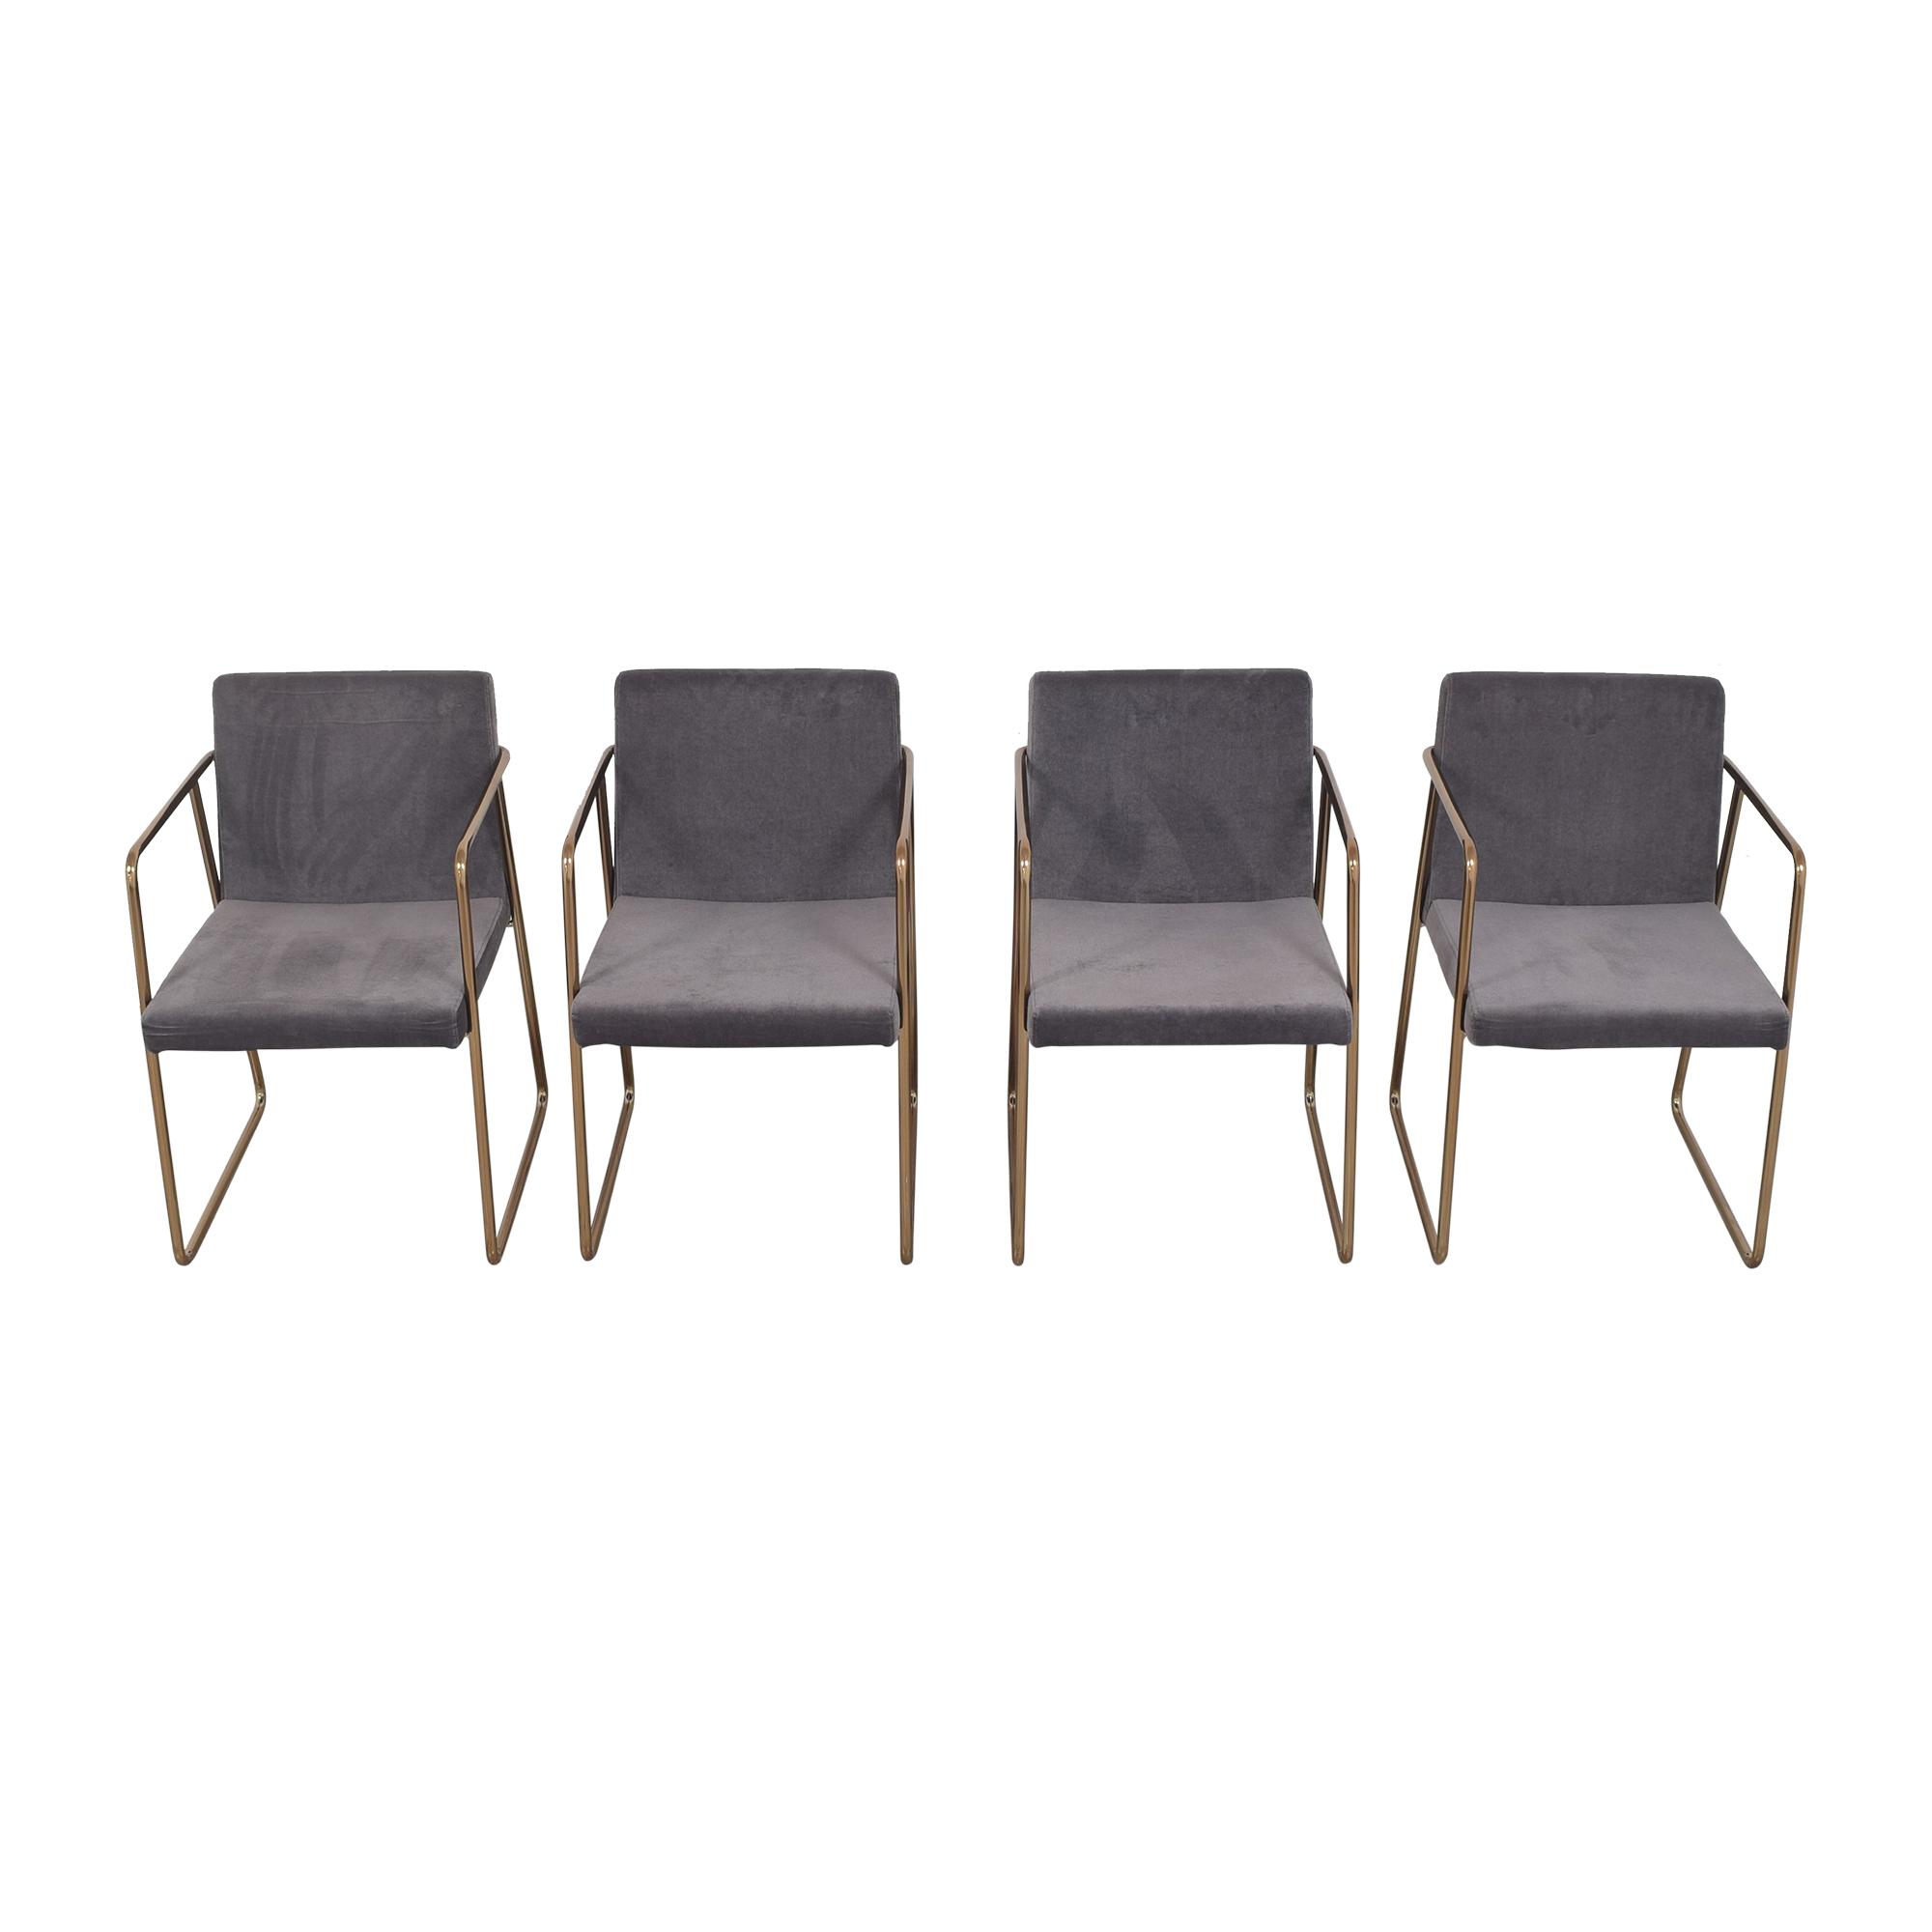 CB2 CB2 Rouka Chairs Dining Chairs